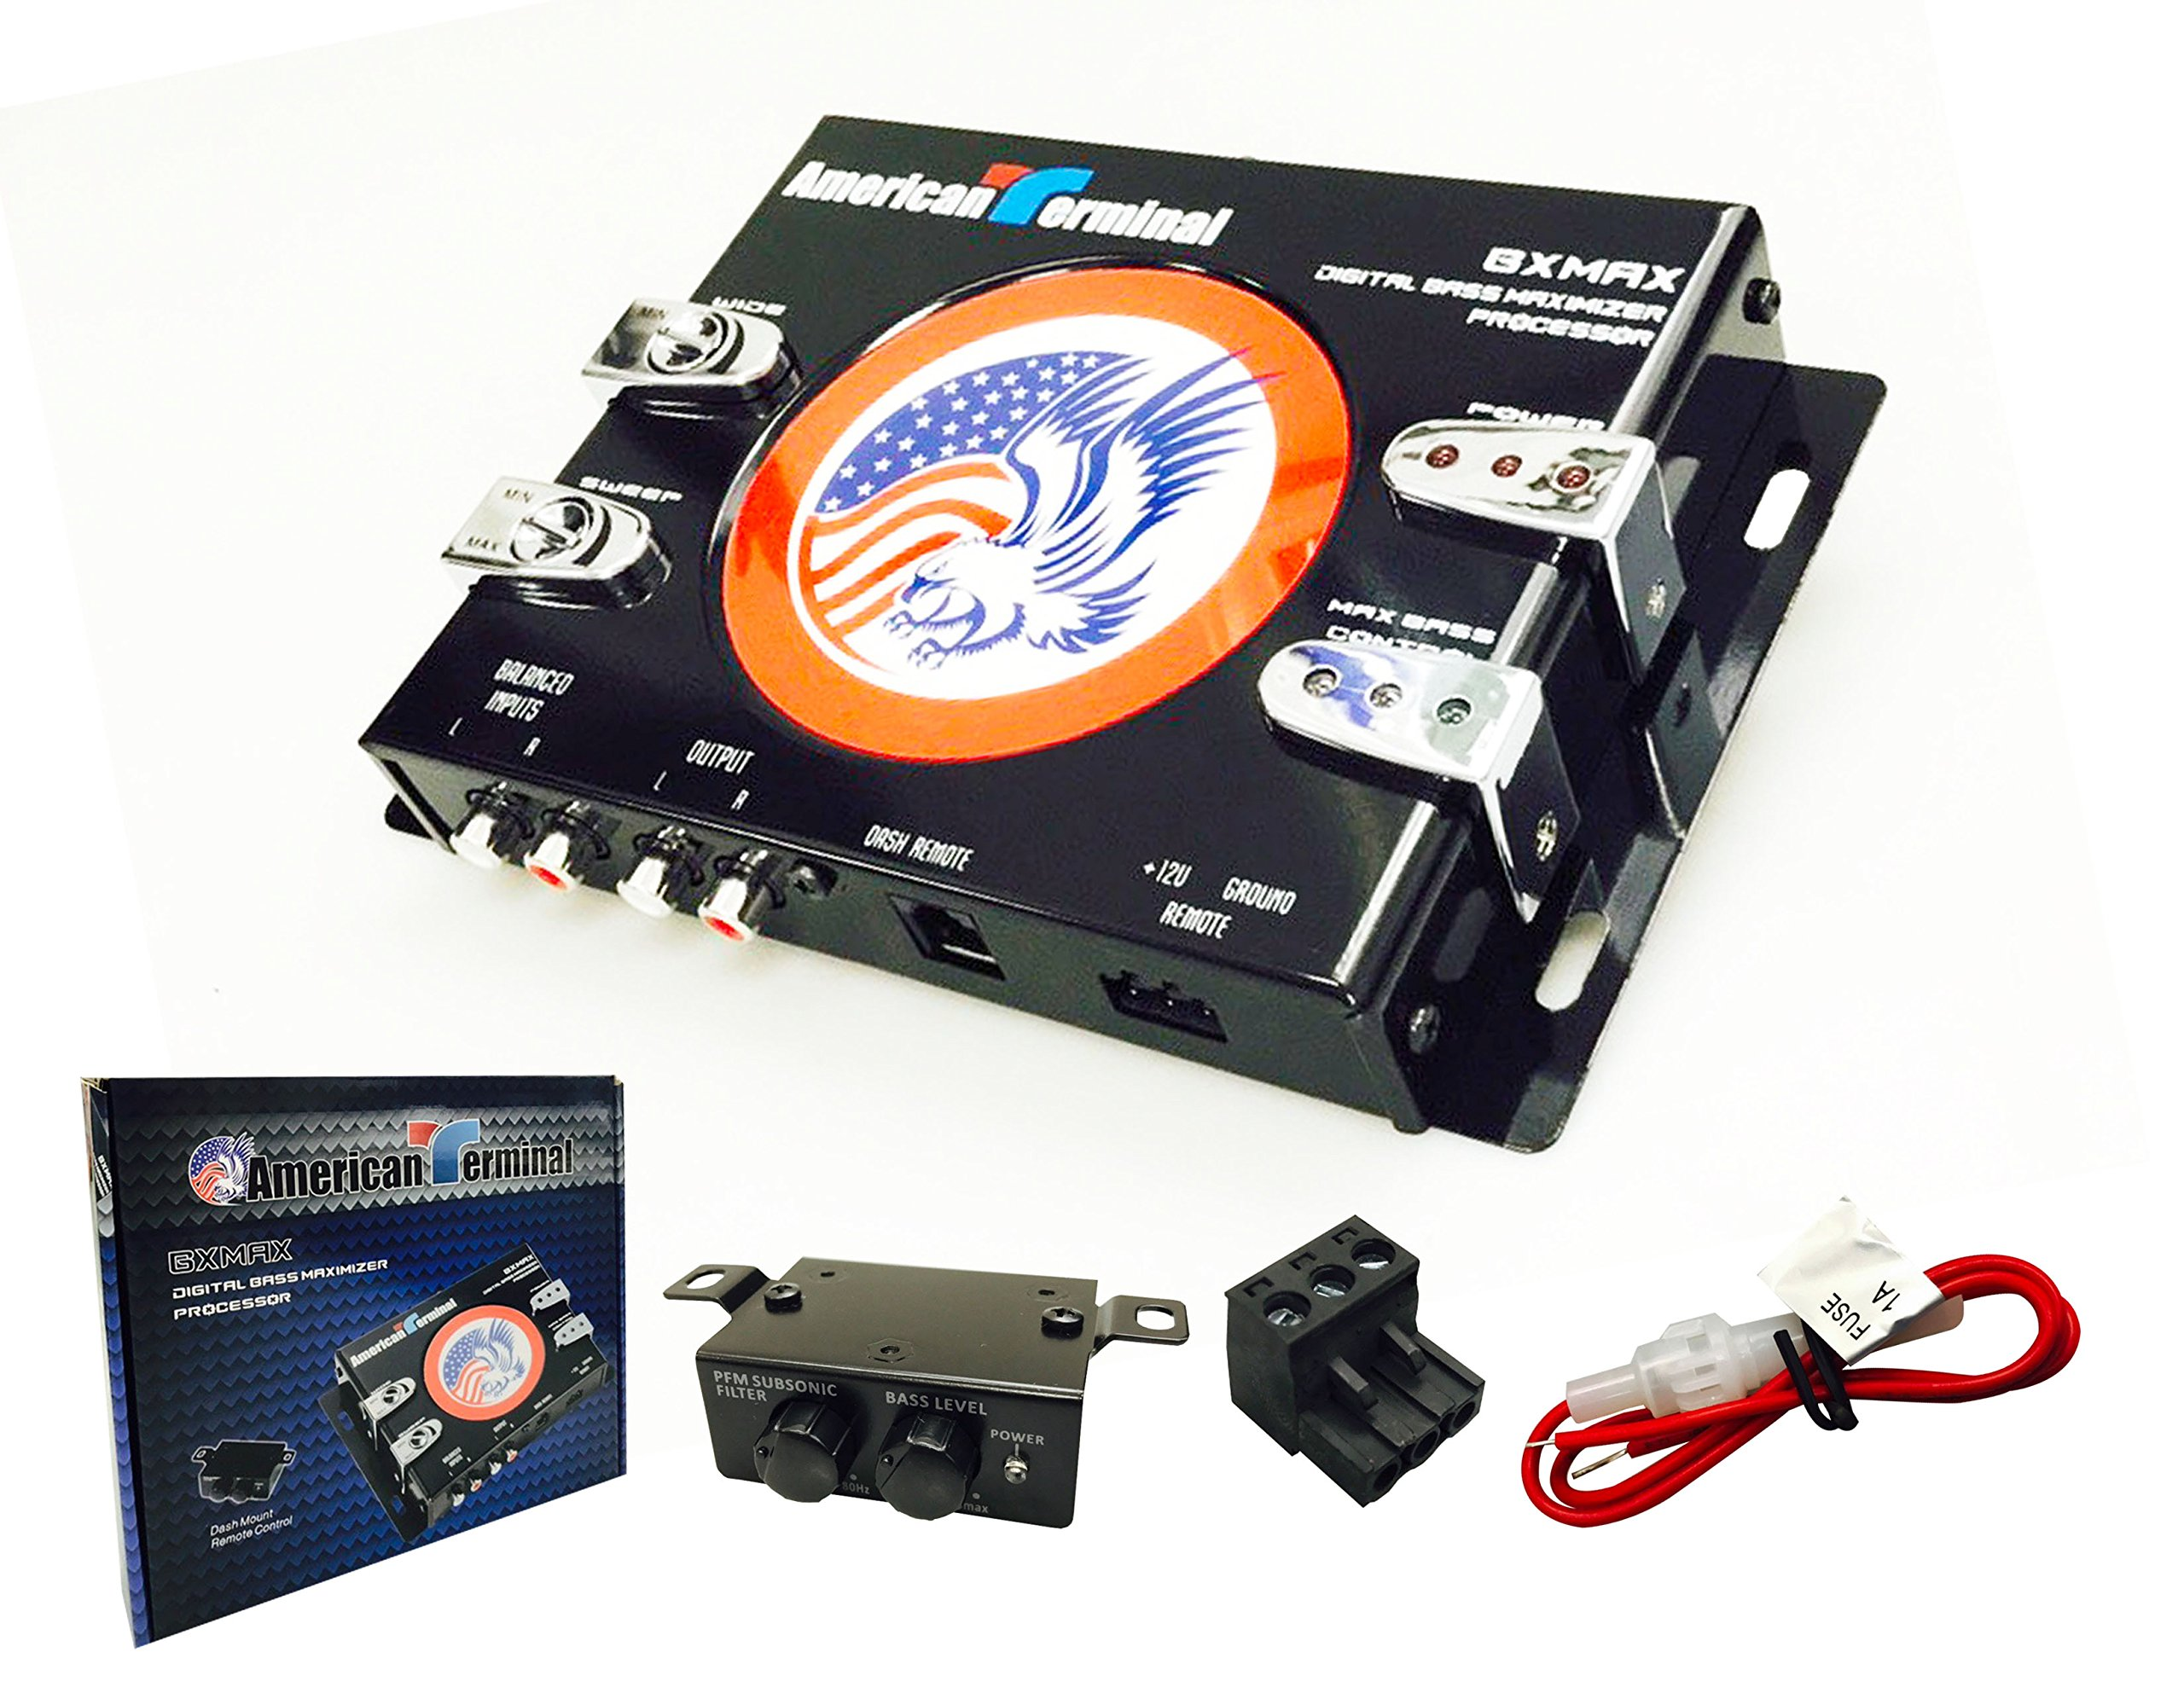 American Terminal BXMAX Digital Bass Maximizer Processor with Dash Mount Remote Control by American Terminal